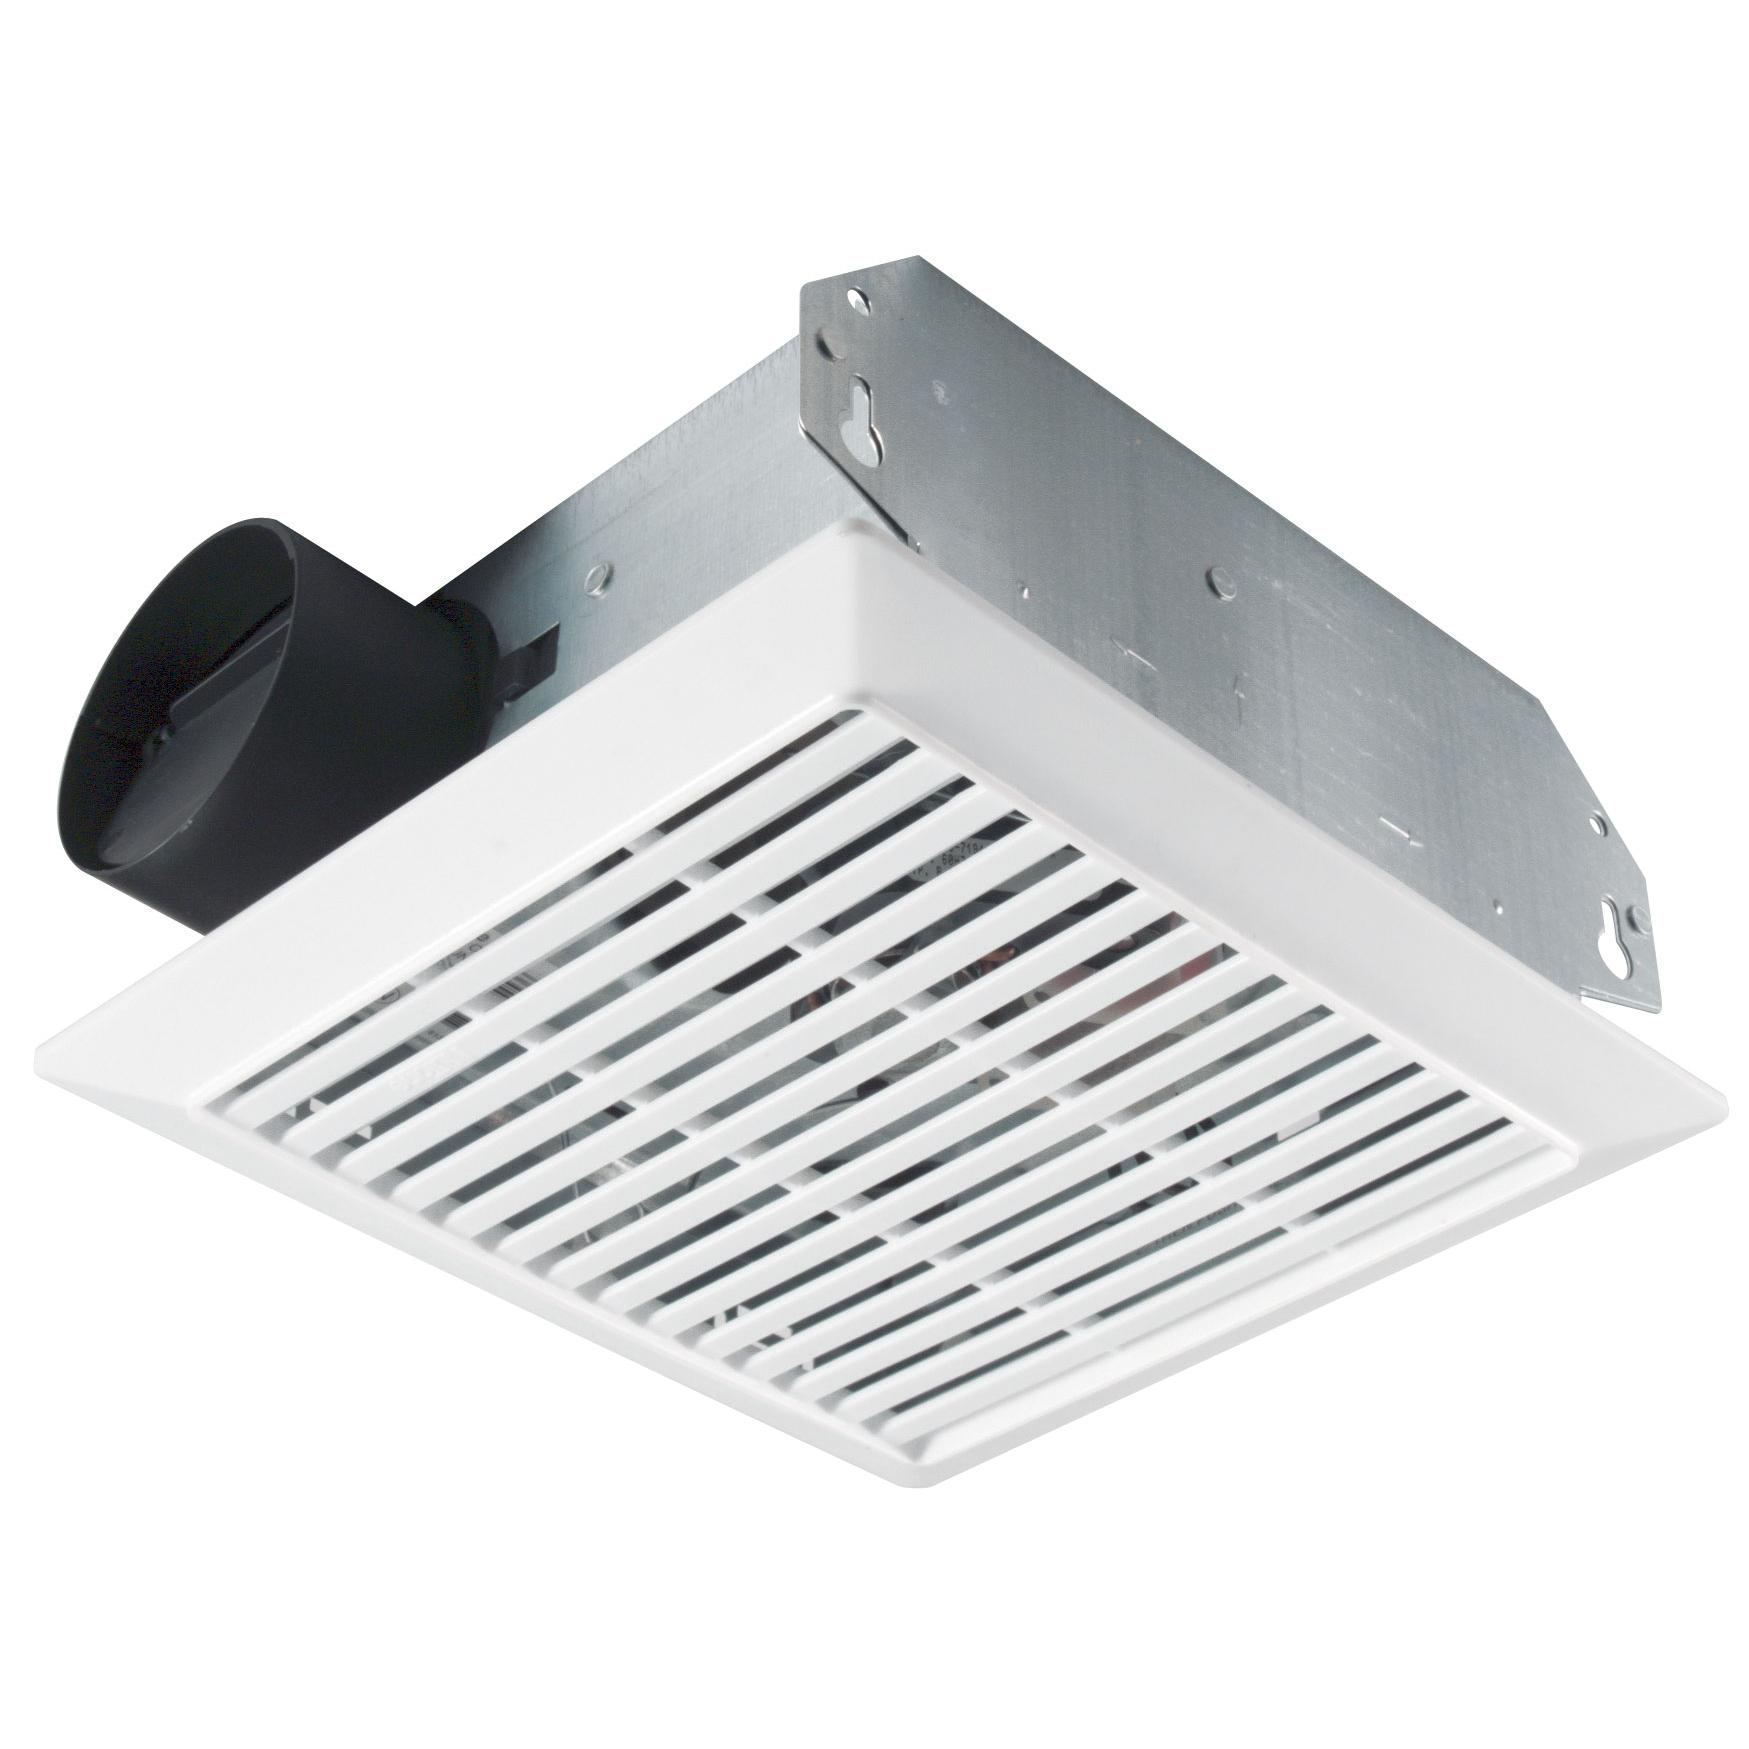 Amazon.com: Broan 690 60 CFM Bathroom Fan Upgrade Kit ...